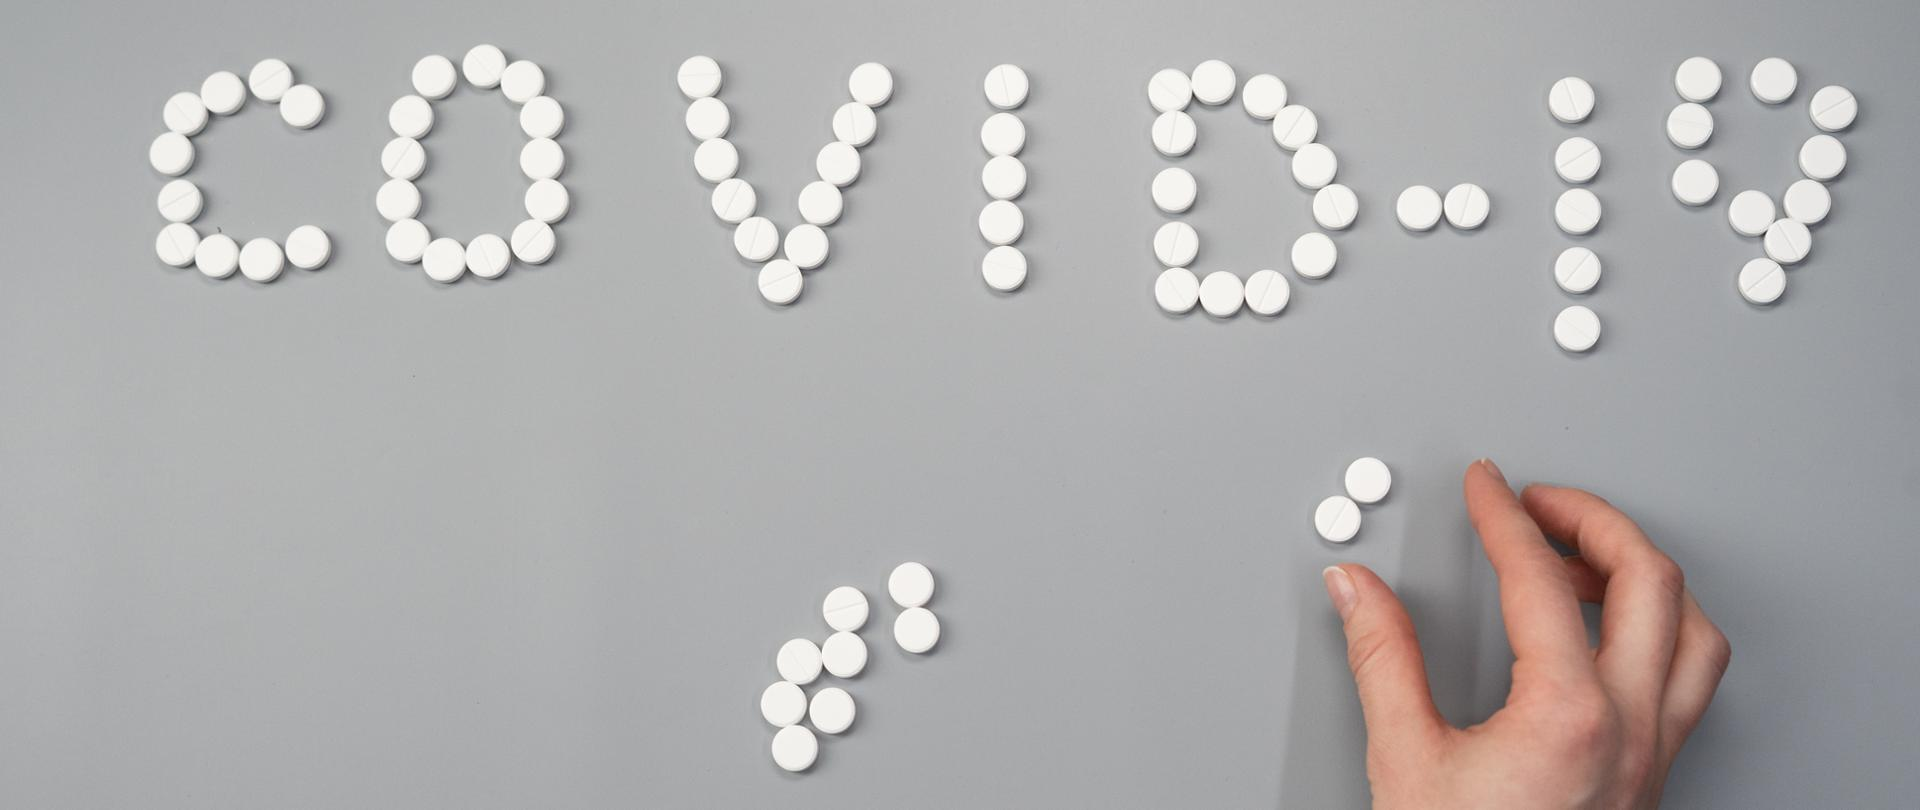 Napis Covid-19 ułożony z tabletek, fot.: cottonbro